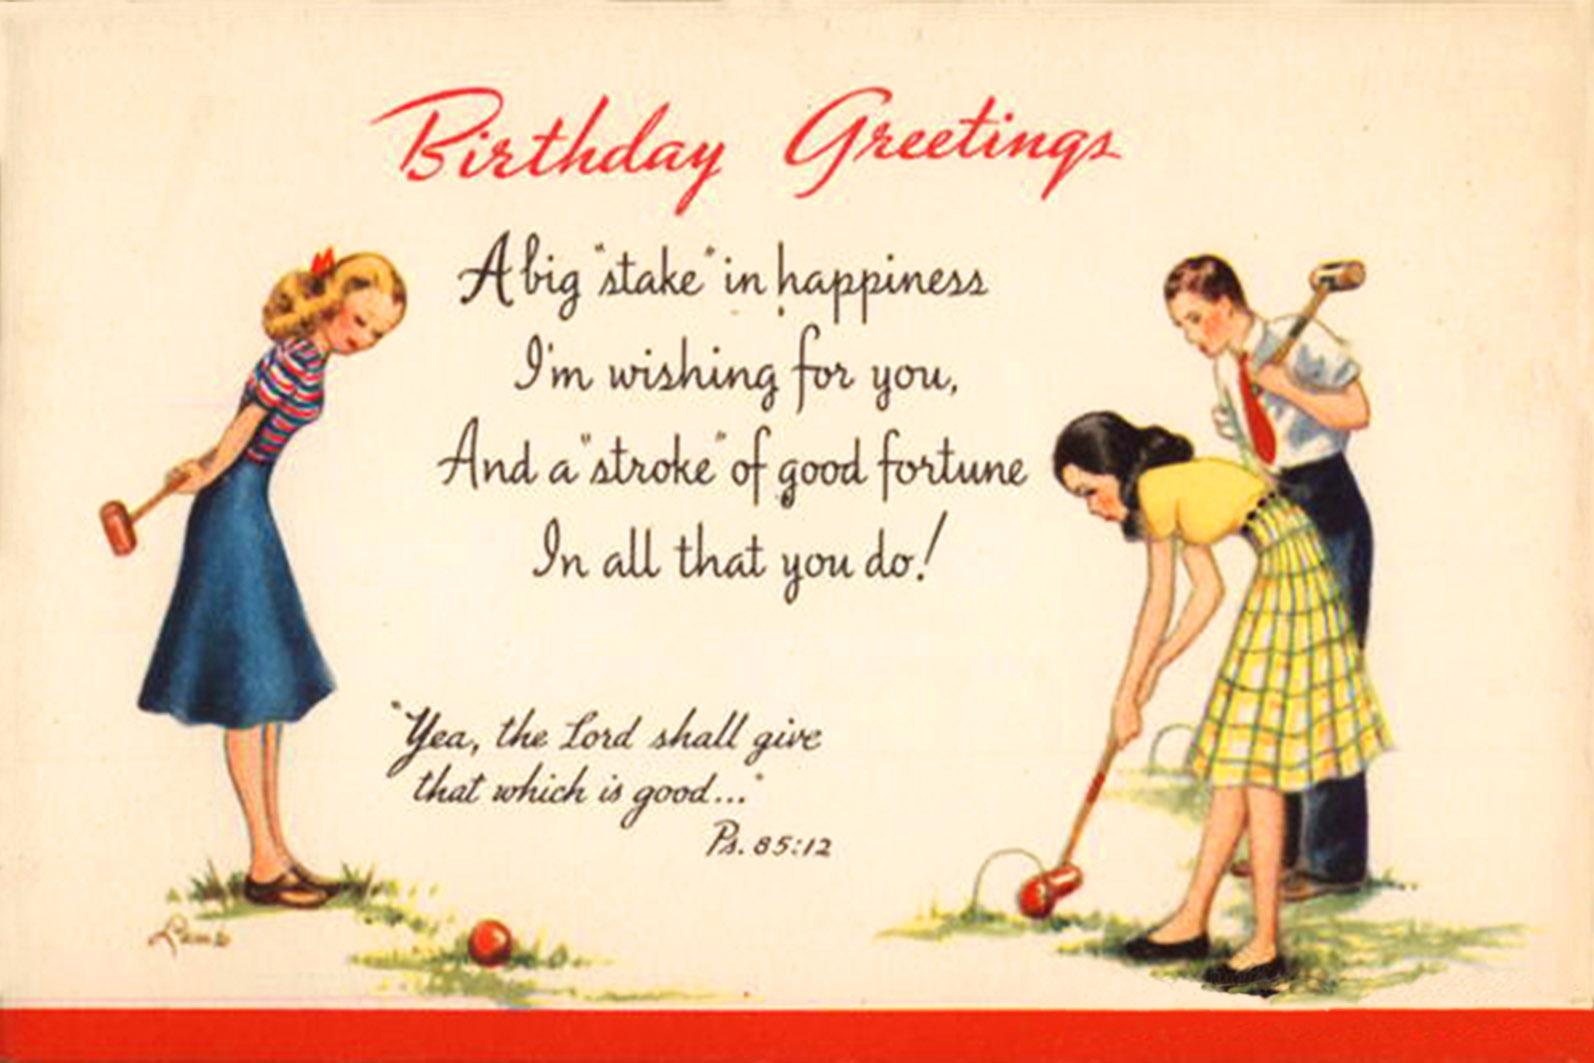 Funny Birthday Greetings